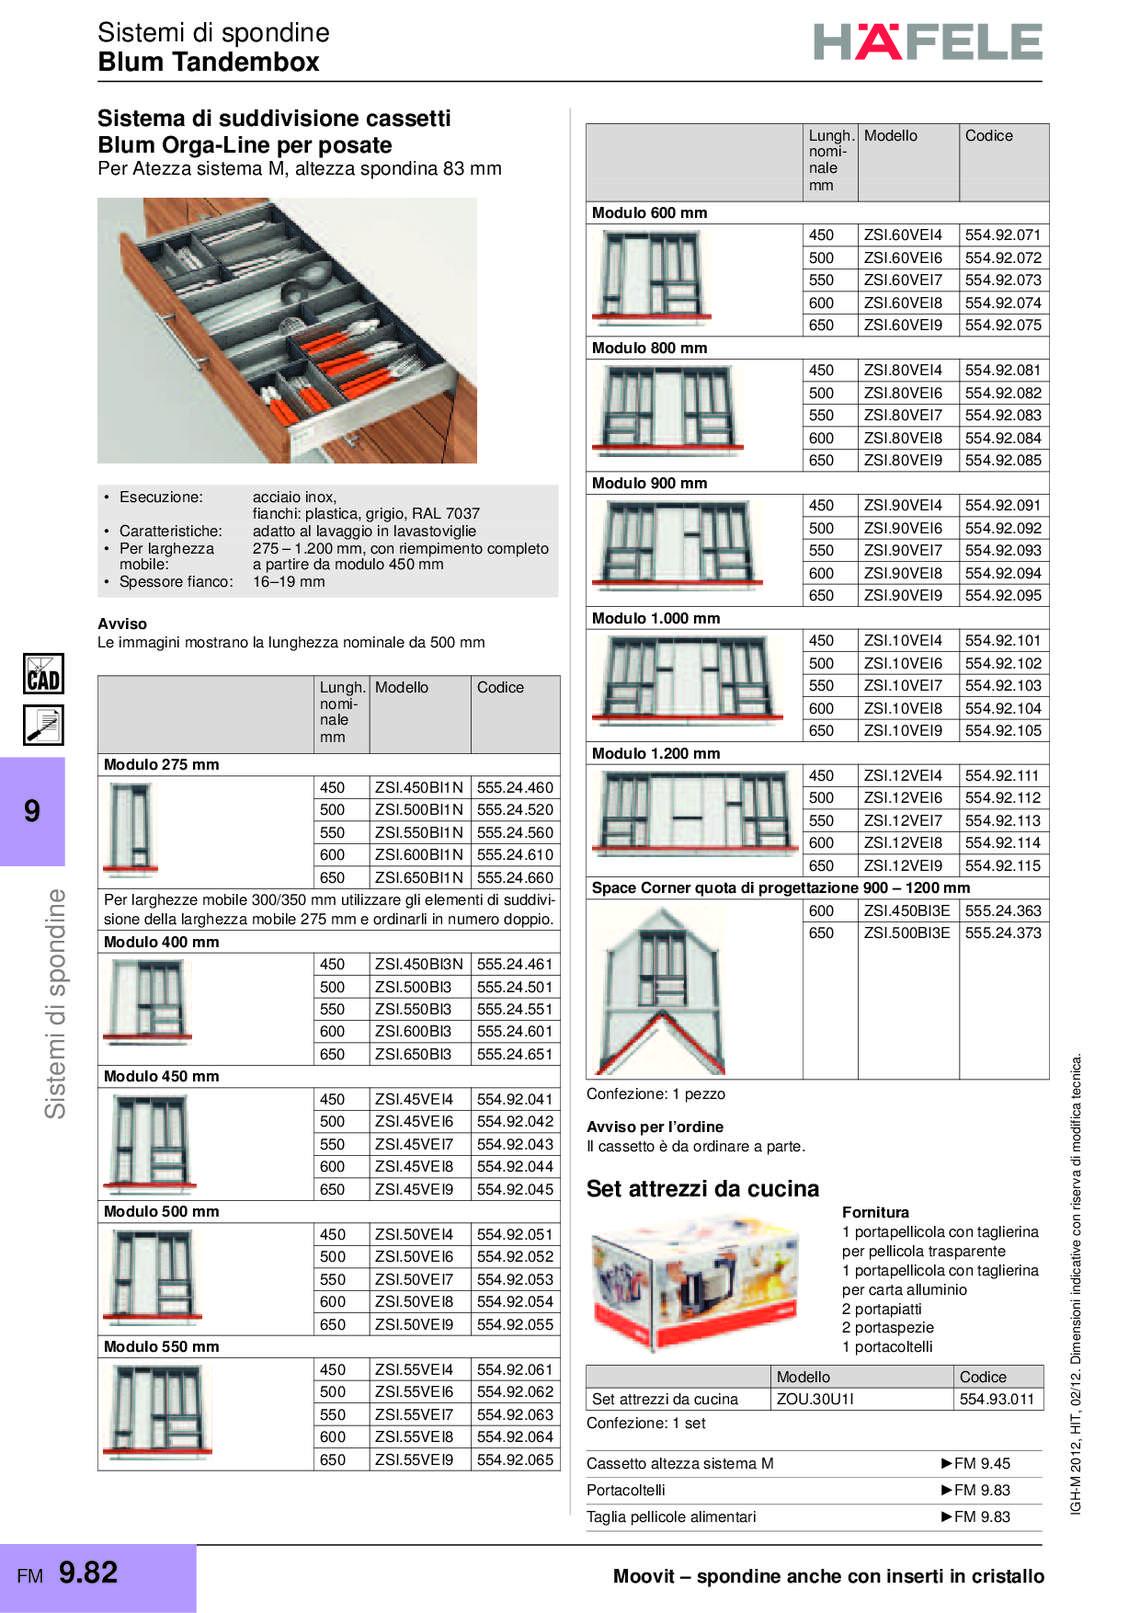 hafele-spondine-e-guide-per-mobili_40_105.jpg